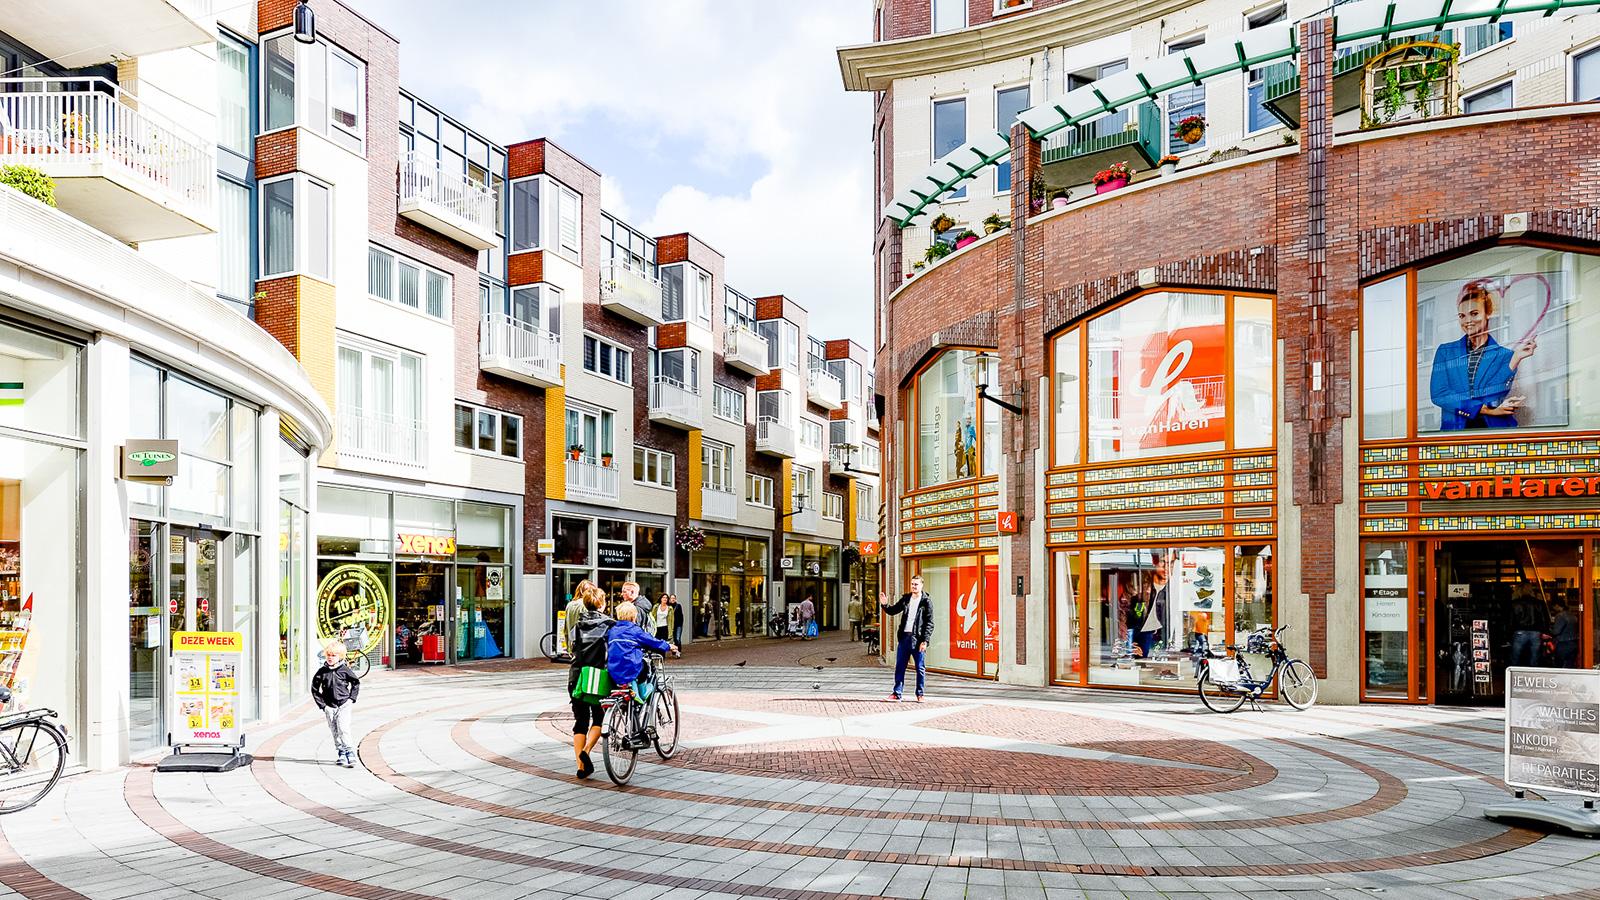 Winkelcentrum Oostpoort, Amsterdam